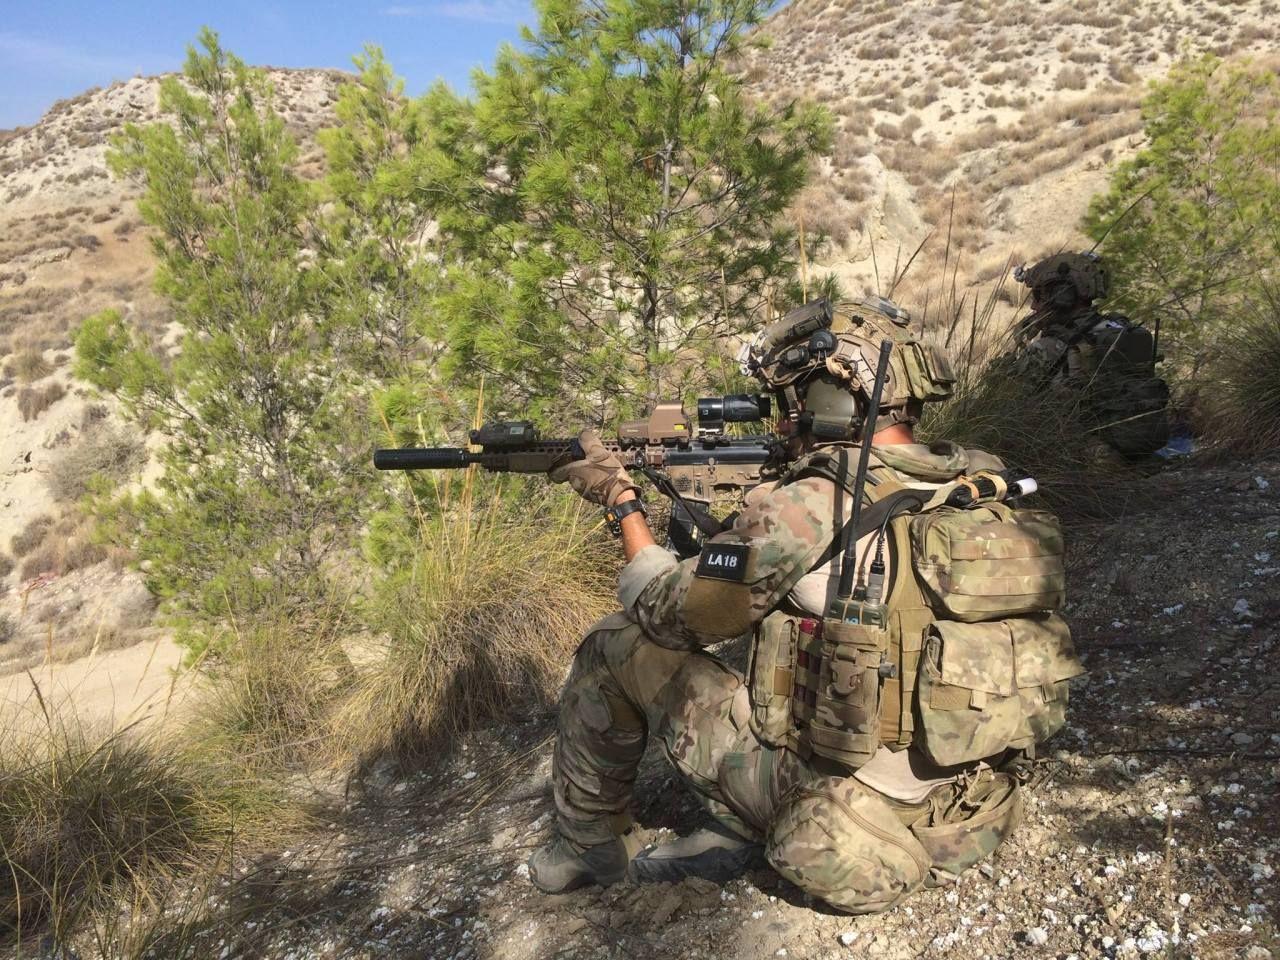 75th Ranger Regiment in Afghanistan c. 2015 [1280x960